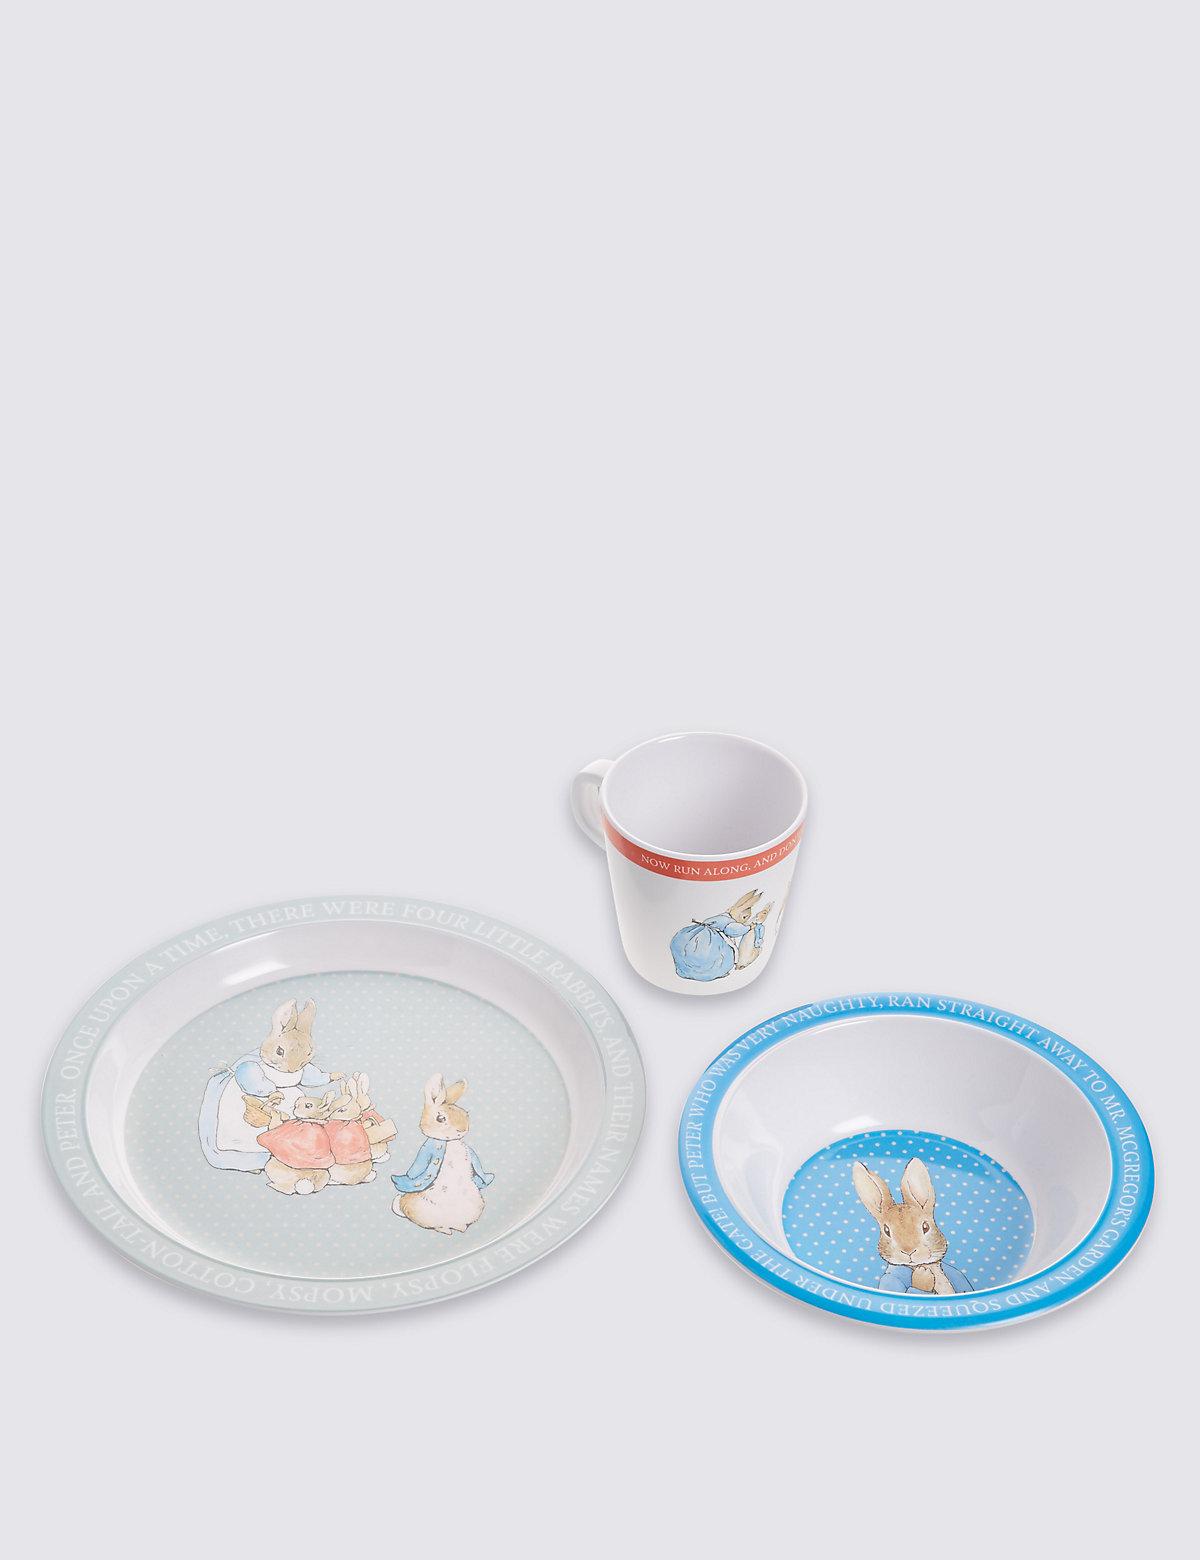 Peter Rabbit Melamine Tableware Set